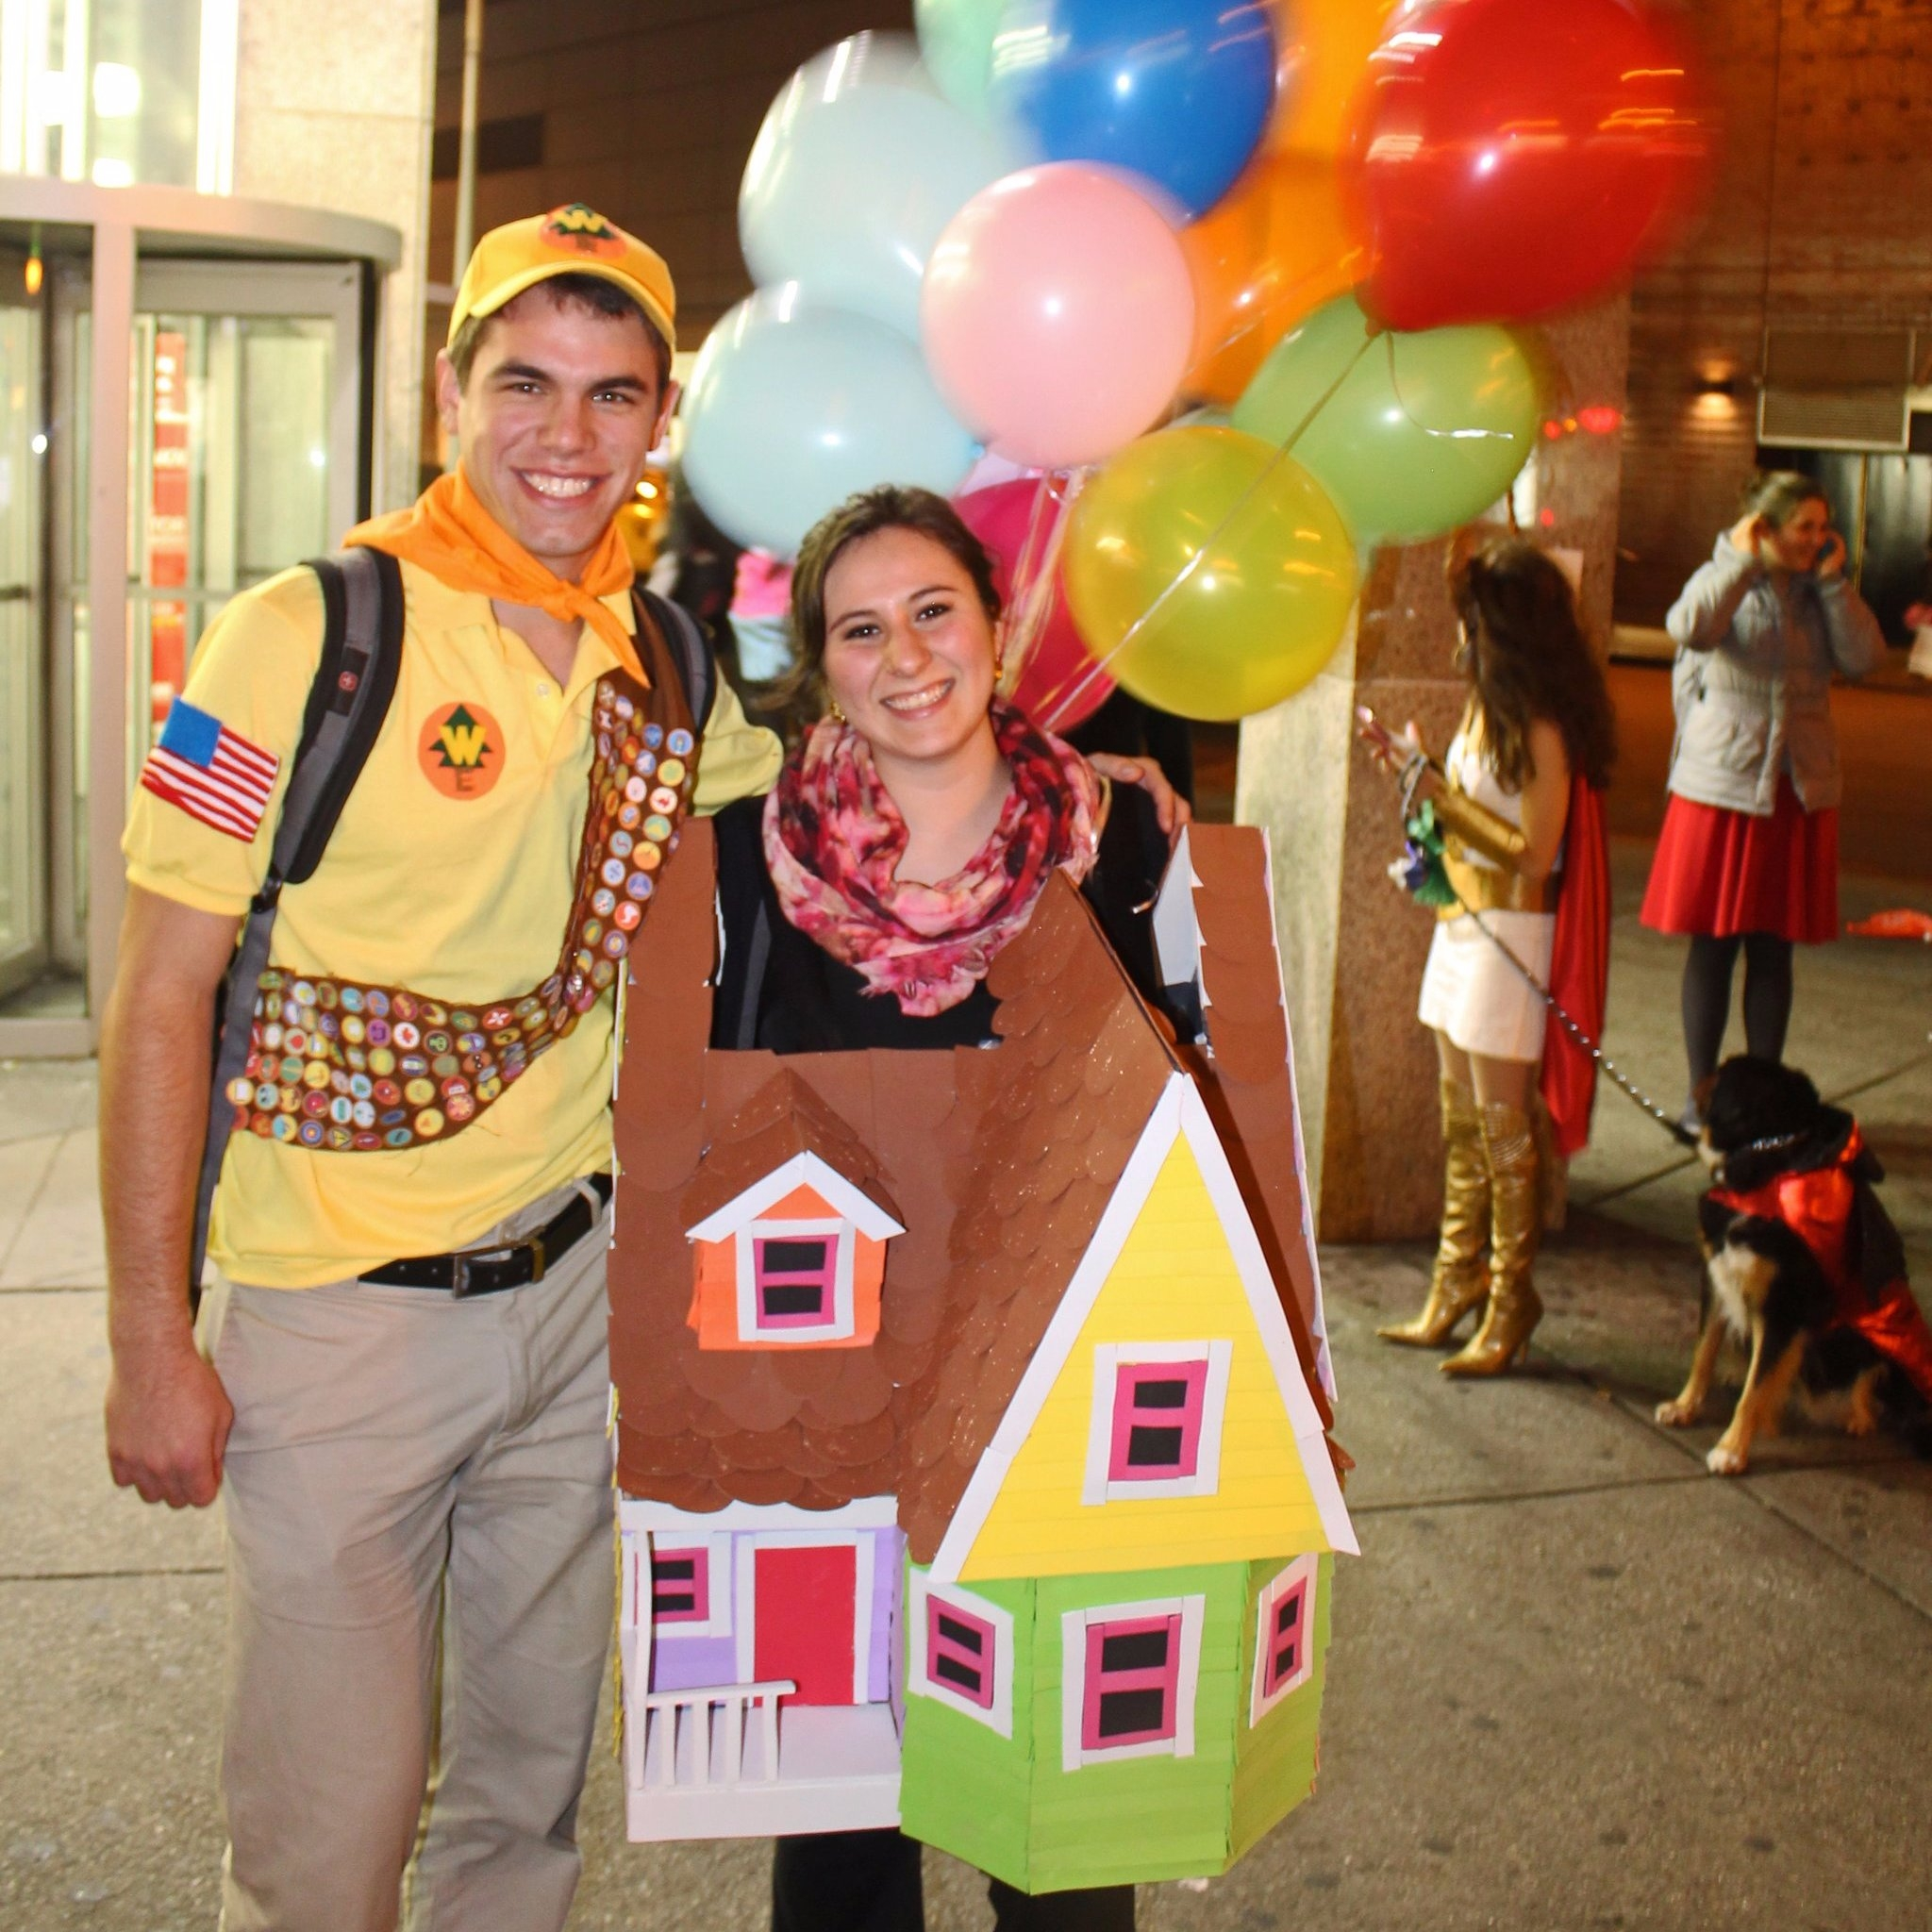 10 Stylish Homemade Halloween Costumes For Women Ideas cheap diy couples halloween costumes popsugar smart living 29 2020